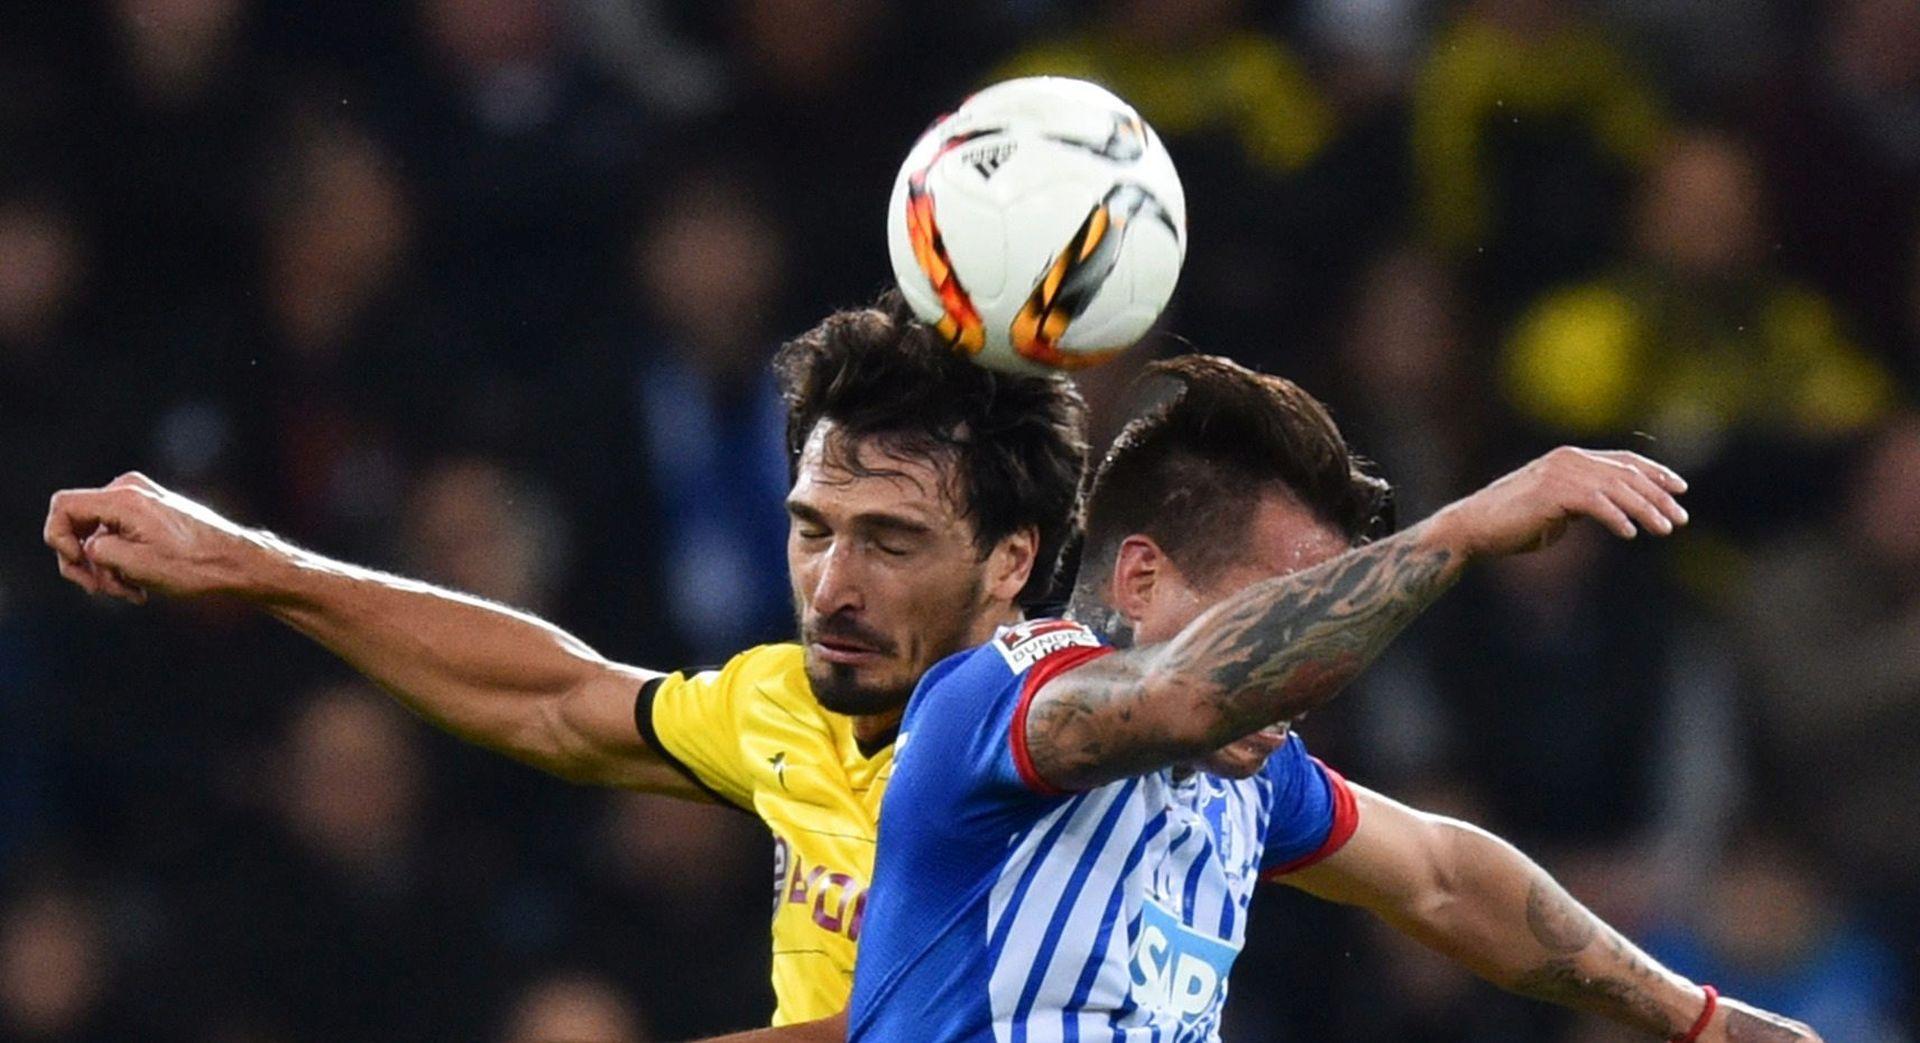 BUNDESLIGA Borussia kiksala kod Hoffenheima, Mönchengladbach do prve pobjede